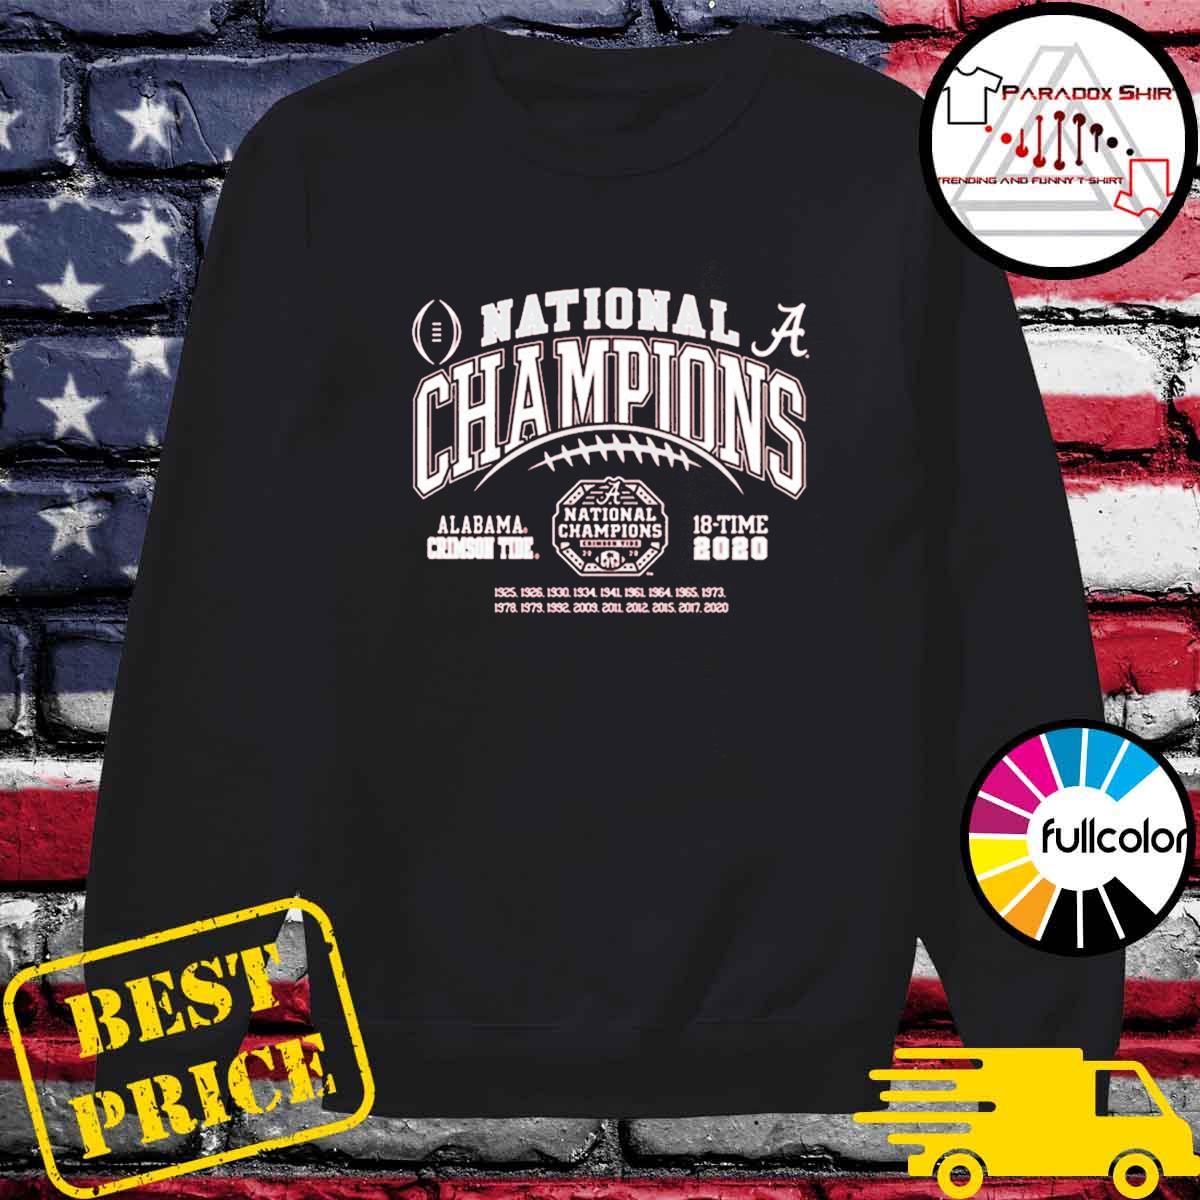 Alabama Crimson Tide National Champs 2020-2021 T-Shirt Sweater